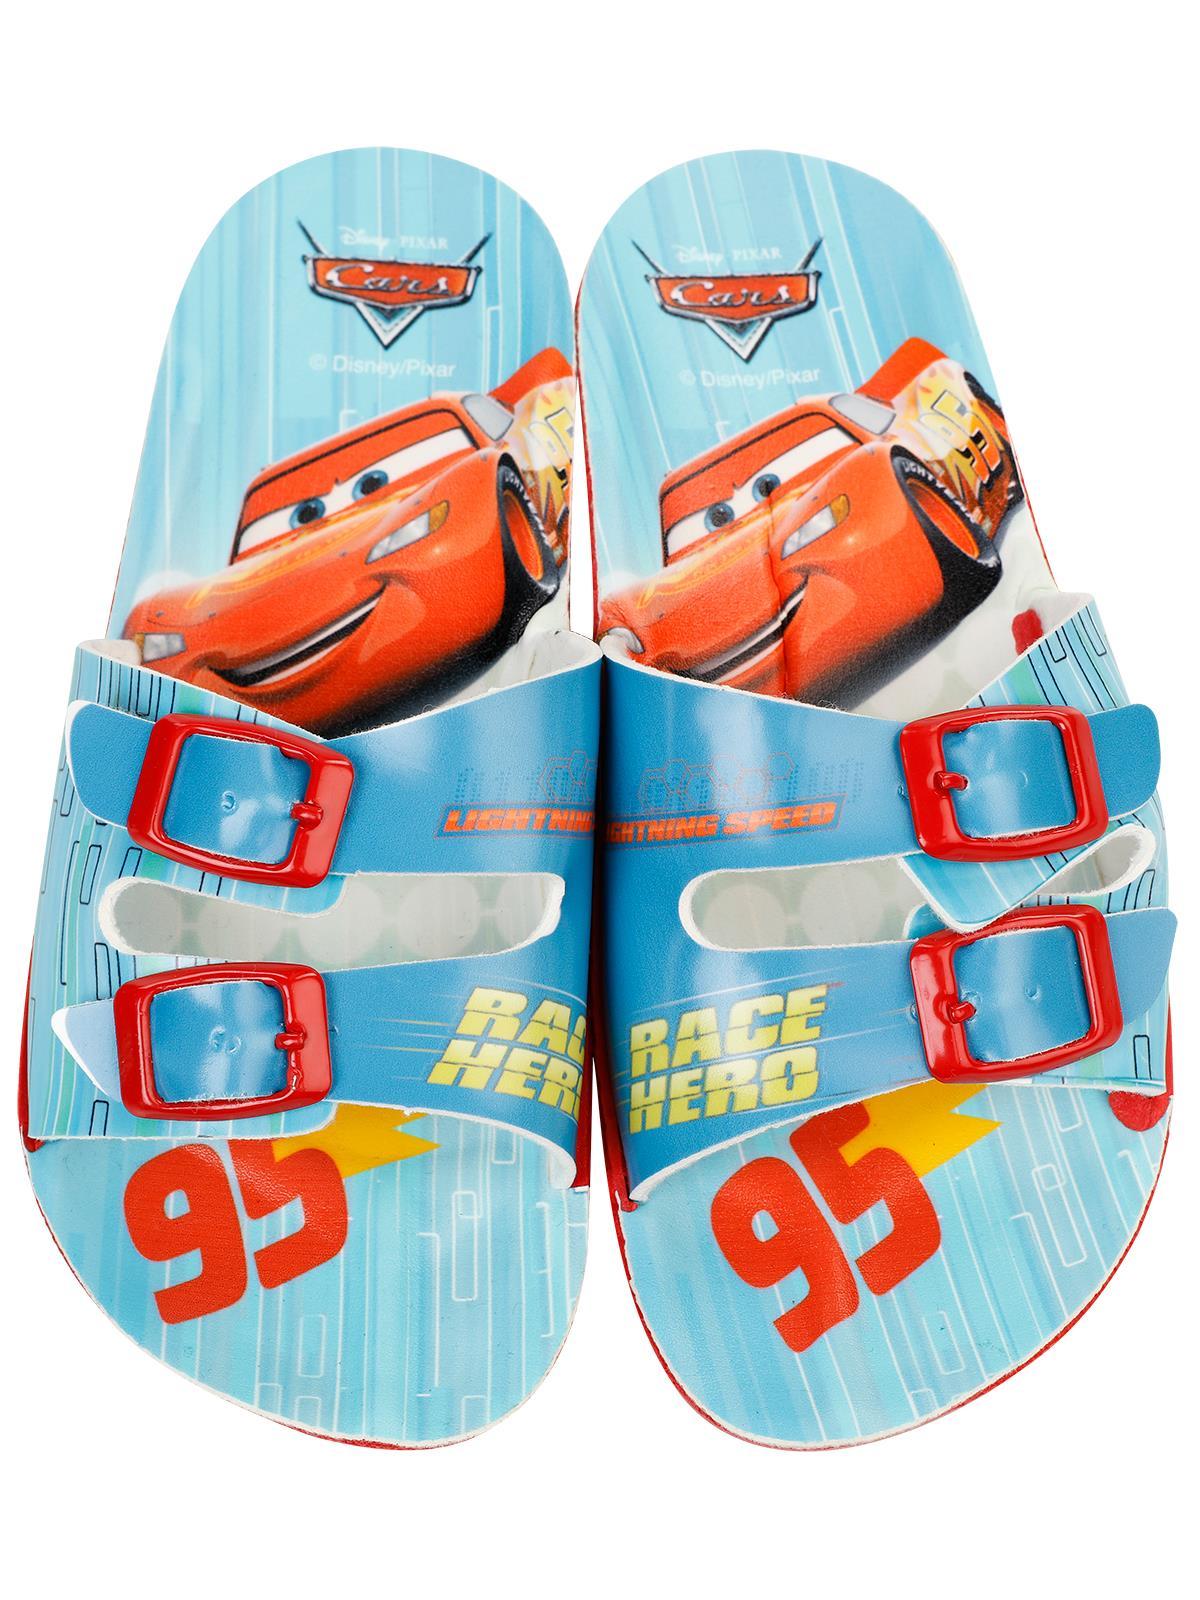 2020 summer boys girls slippers home outdoors beach pool Sandals soft non-slip bath slippers Kids Slippers 26-29 size